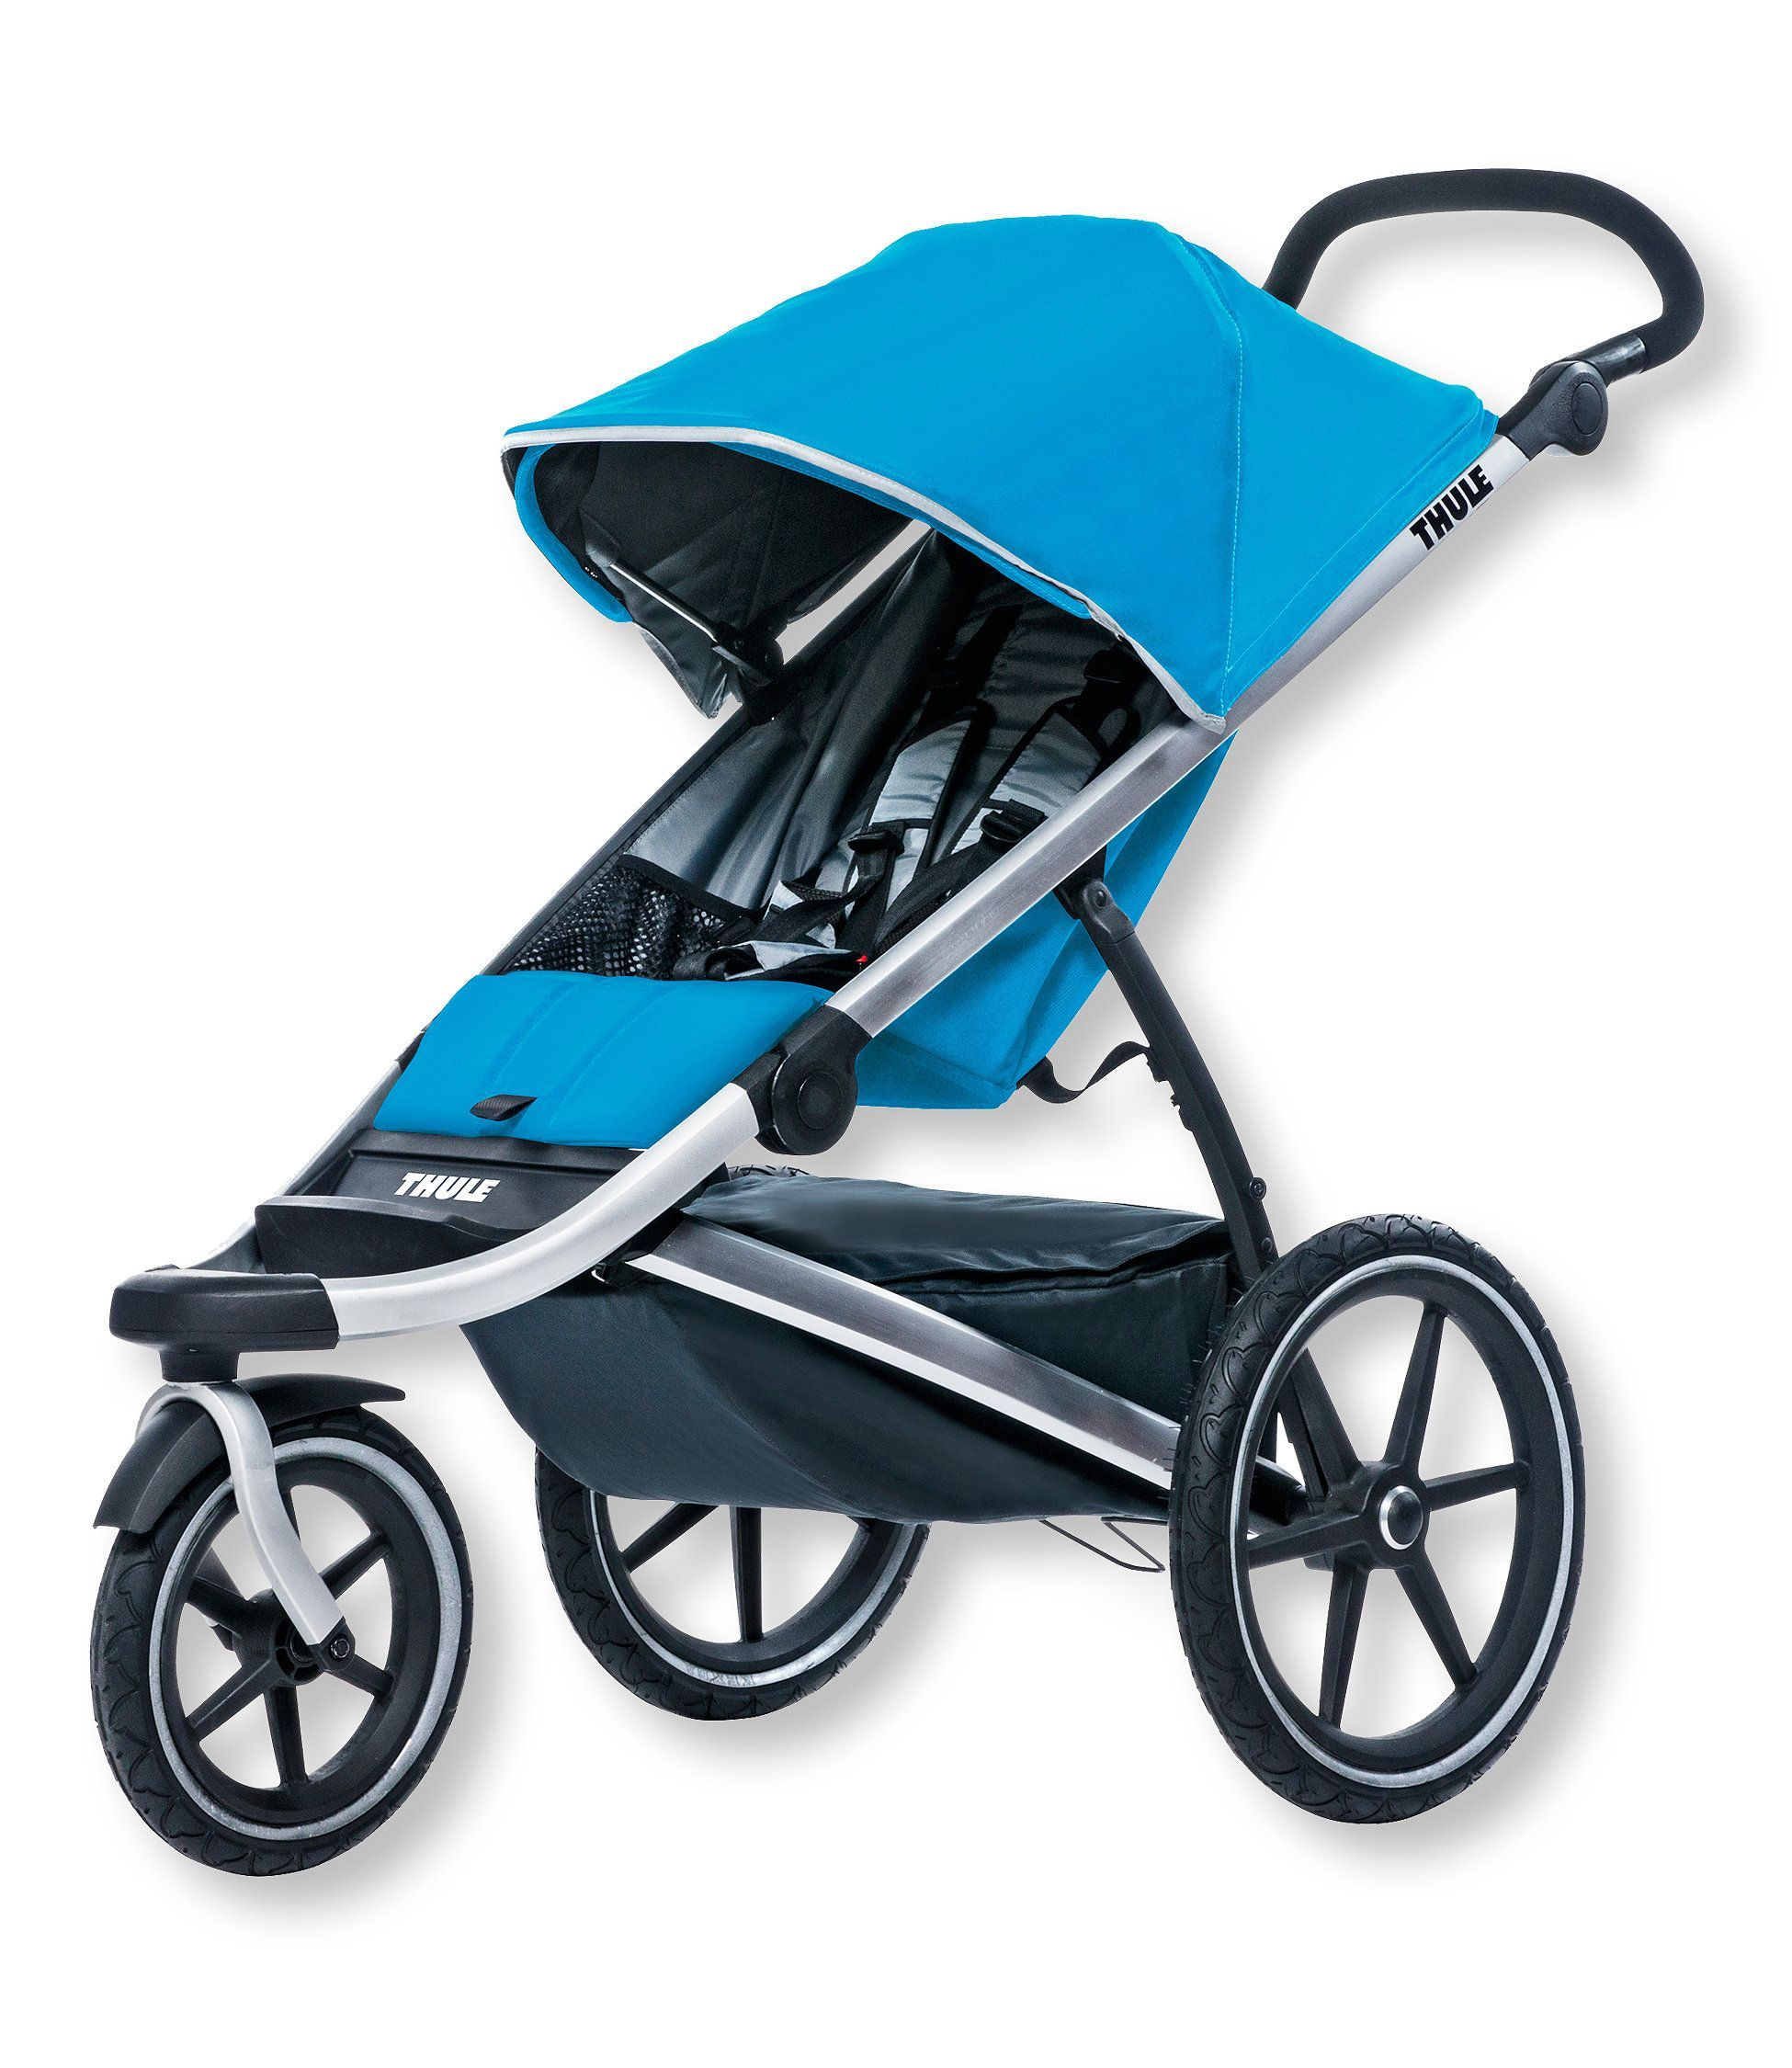 Thule Urban Glide Sport Stroller Thule jogging stroller